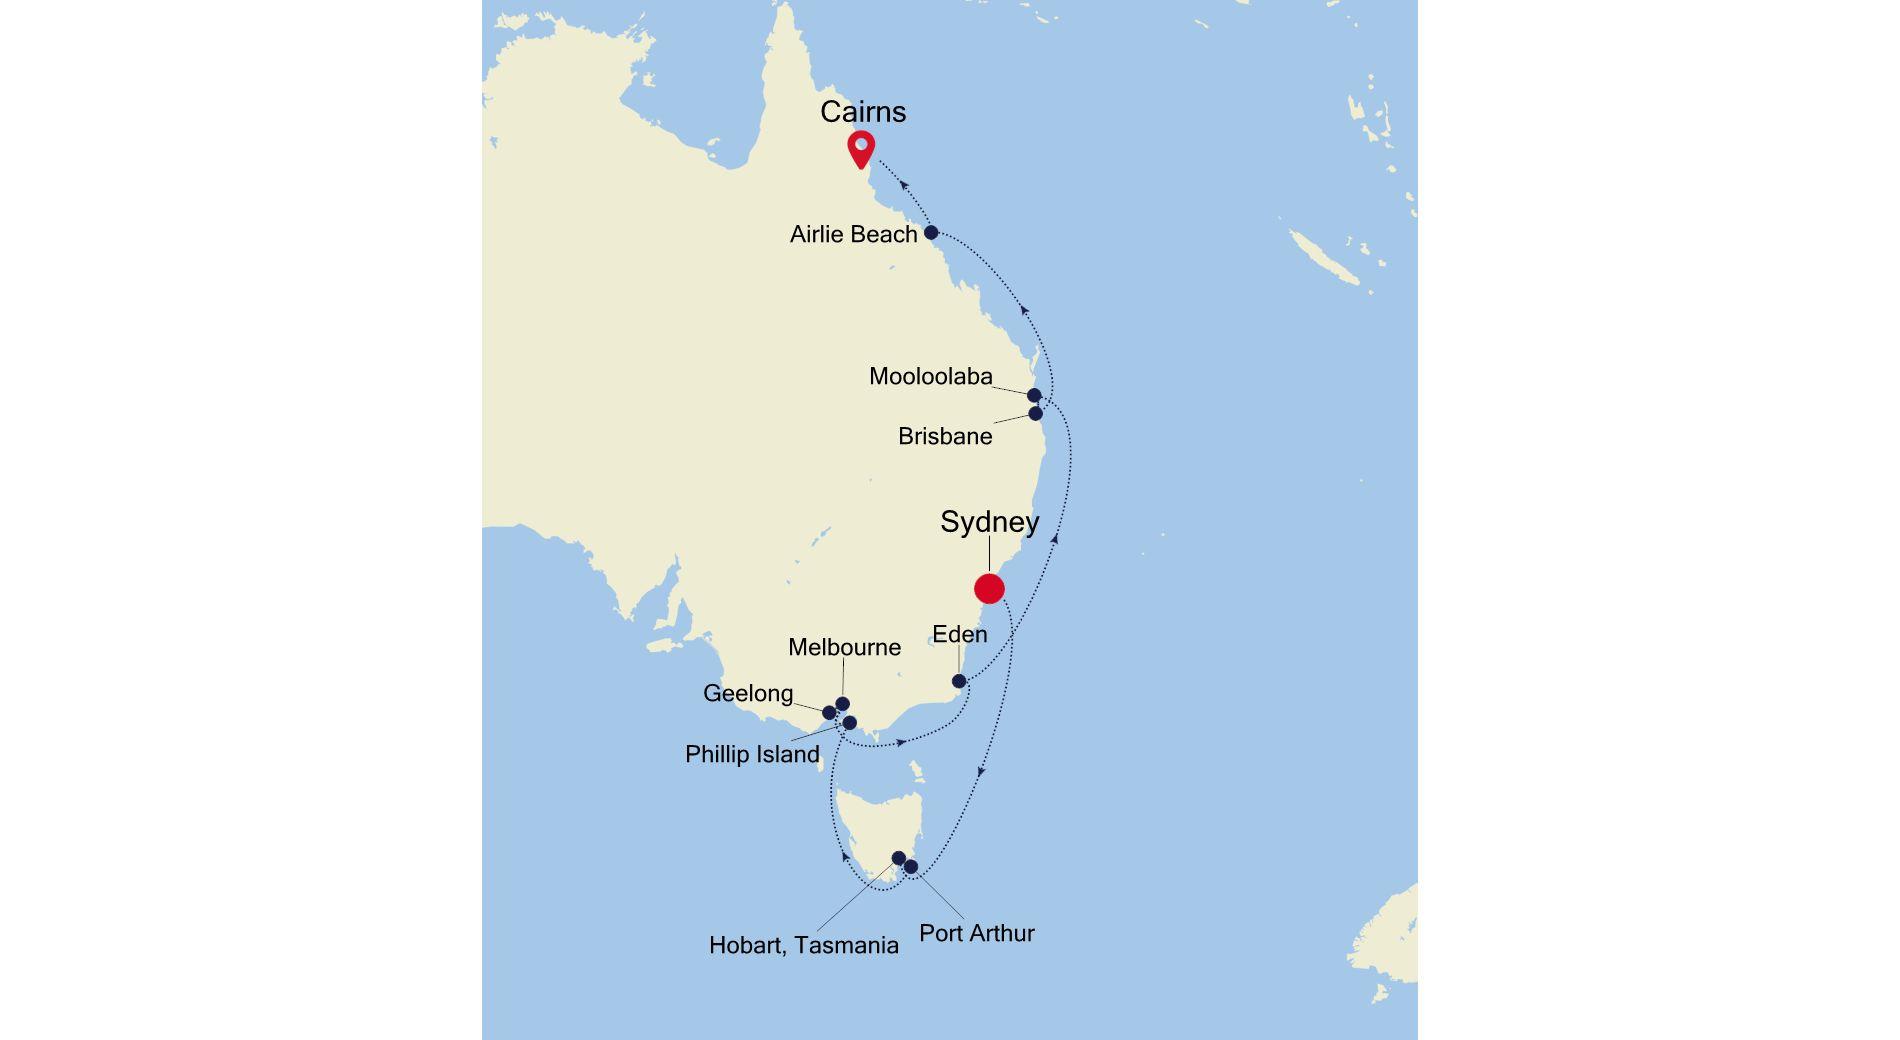 SS220404016 - Sydney à Cairns